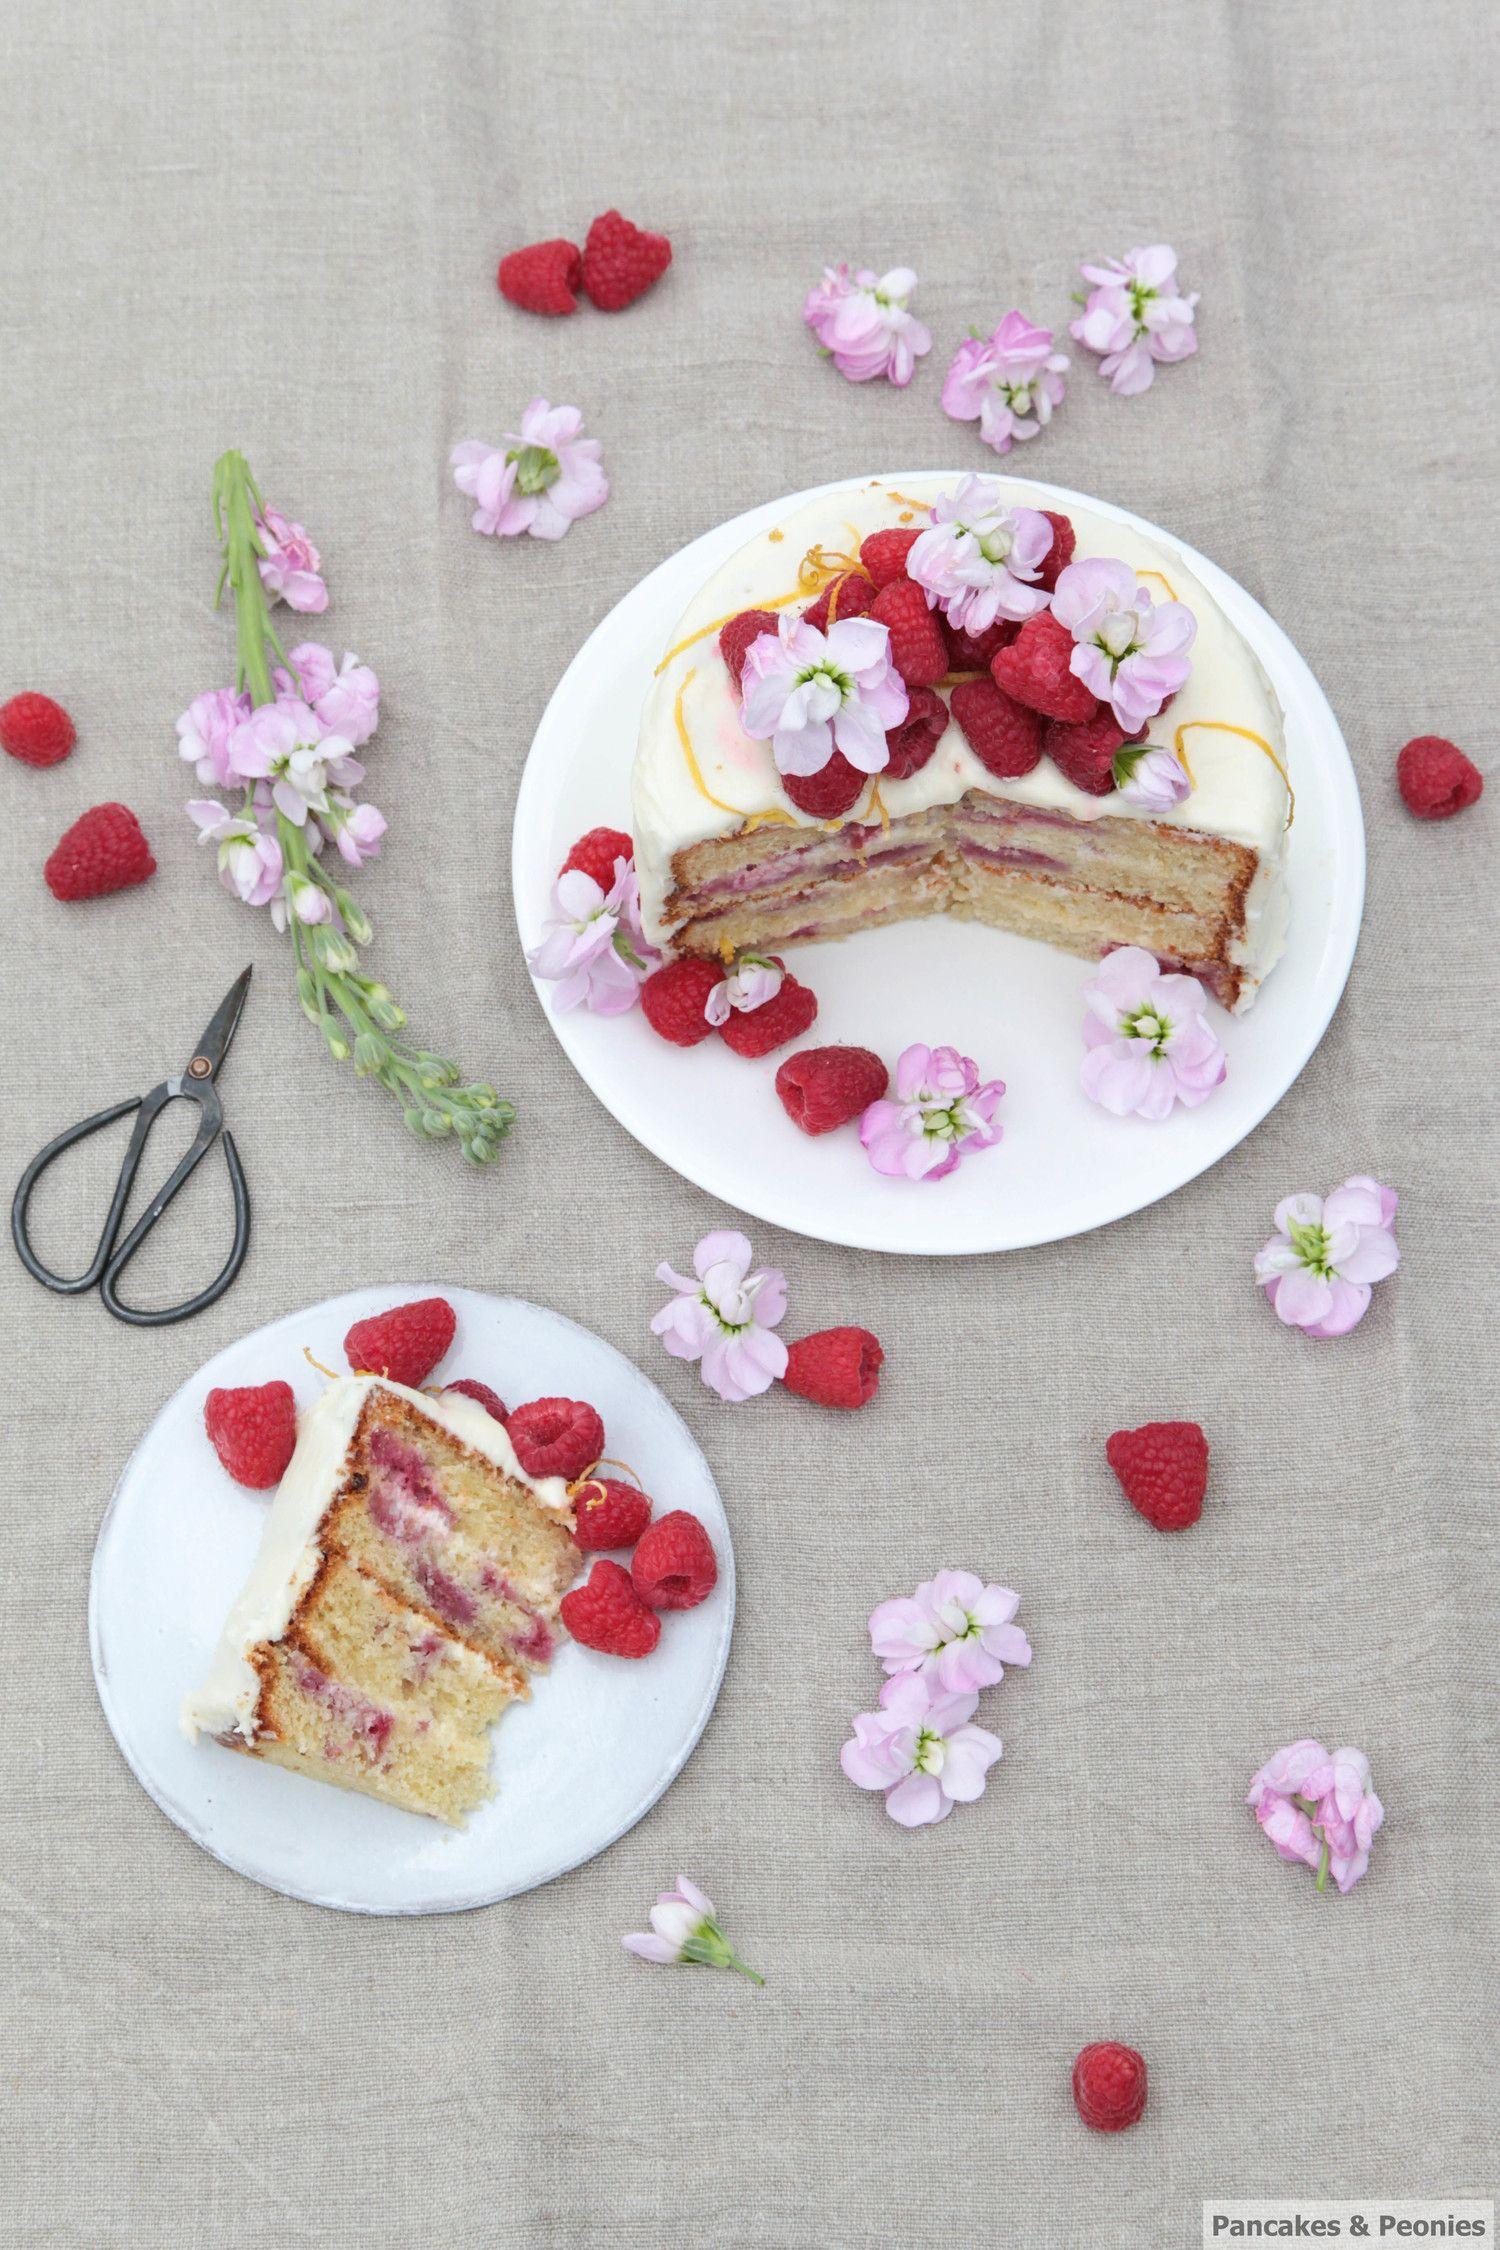 Zesty Raspberry Cake - Pancakes & Peonies